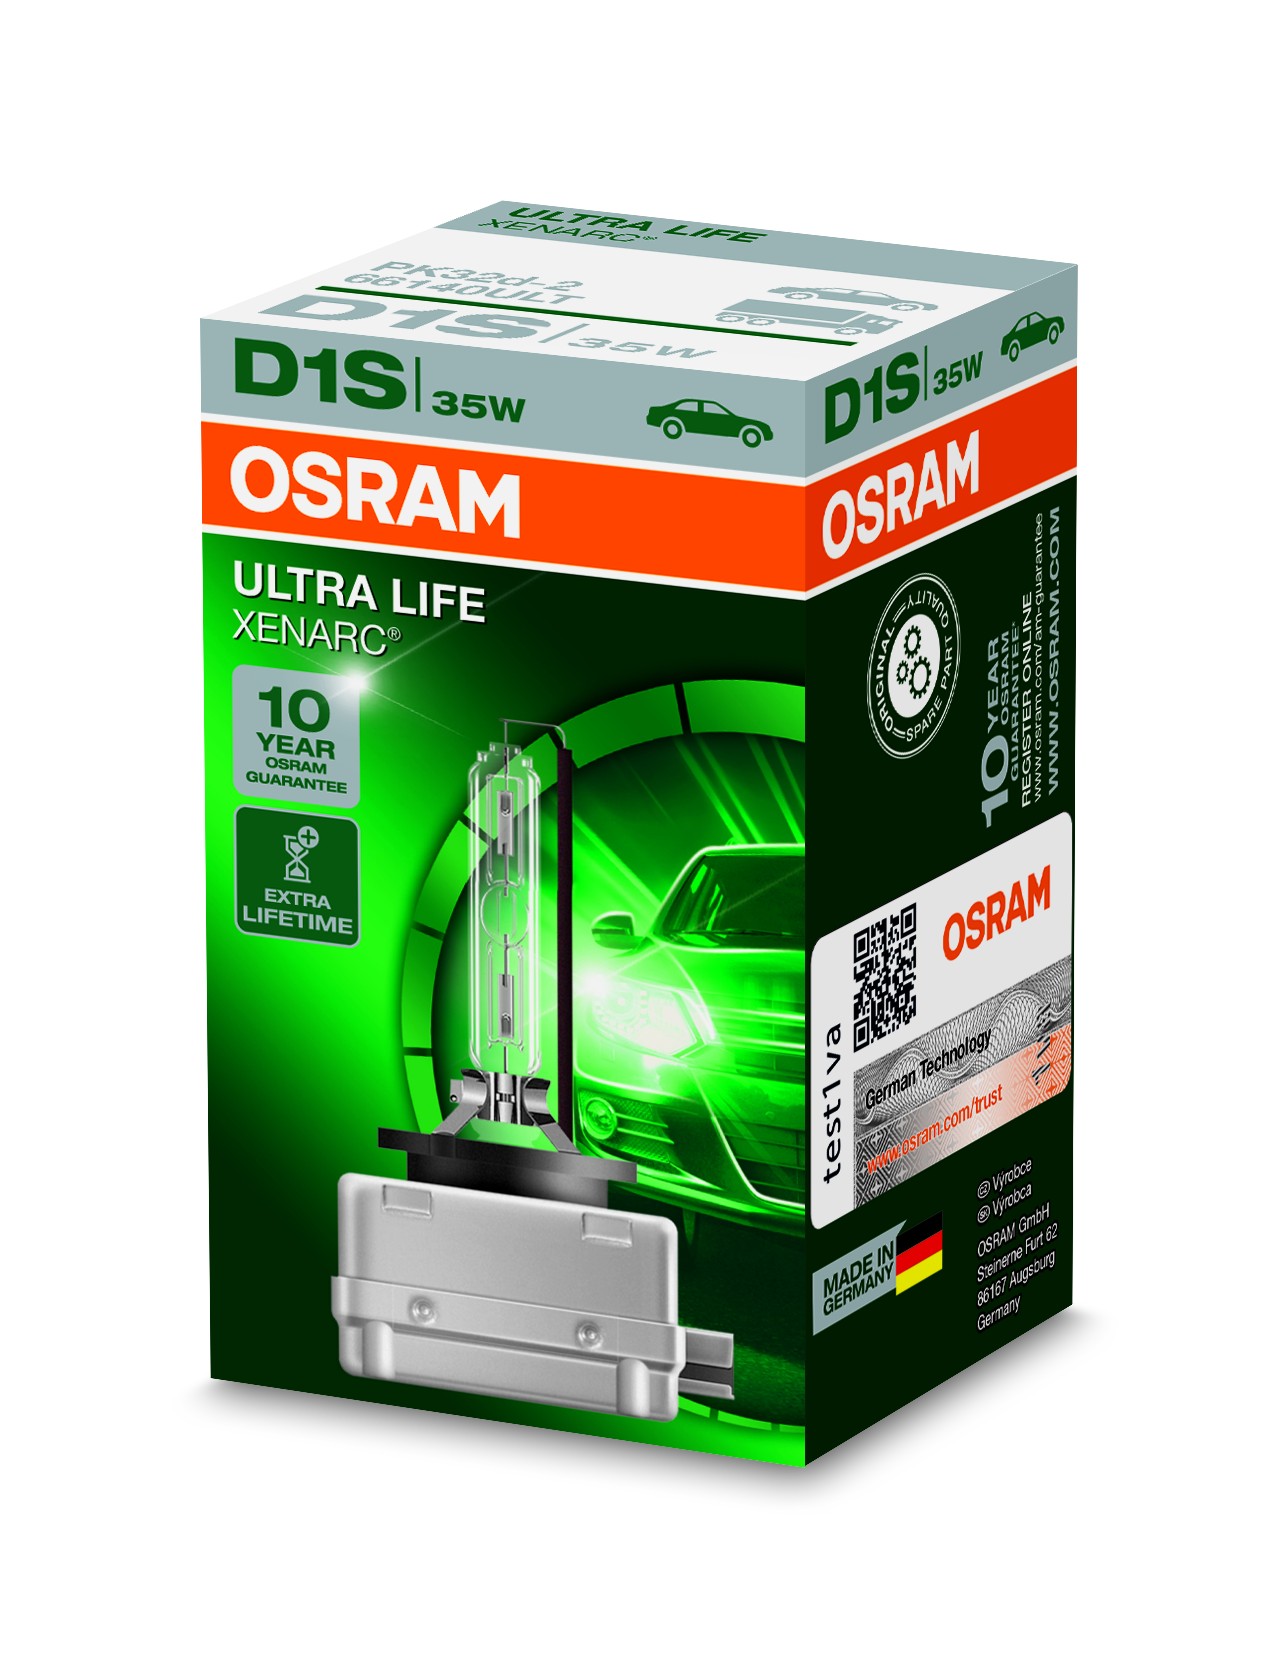 Osram Xenonová výbojka, XENARC ULTRALIFE, D1S, PK32d-2, 12/24V, 35W, 66140ULT